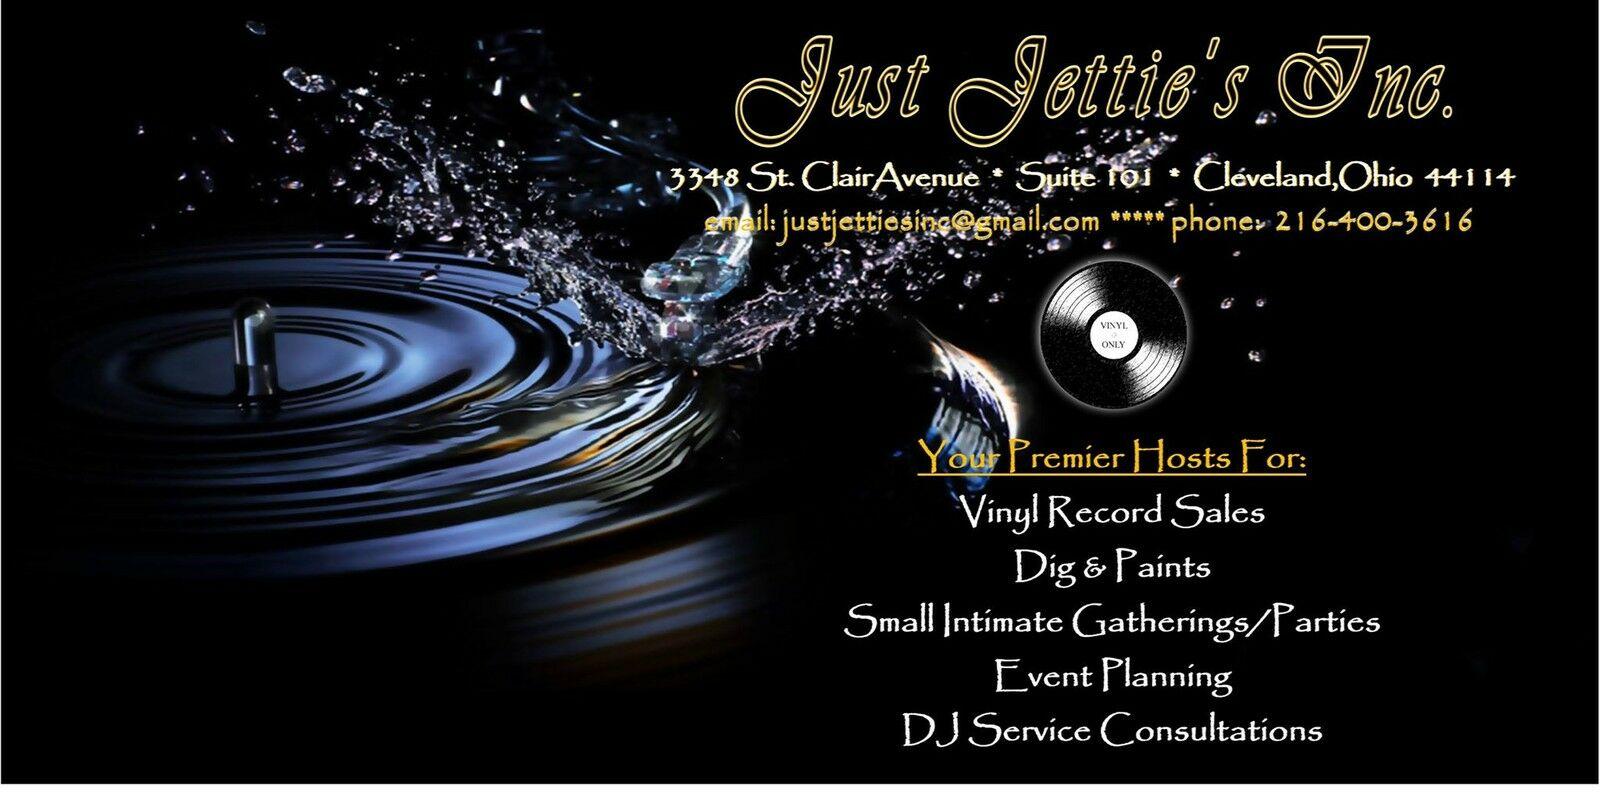 All $ales Vinyl